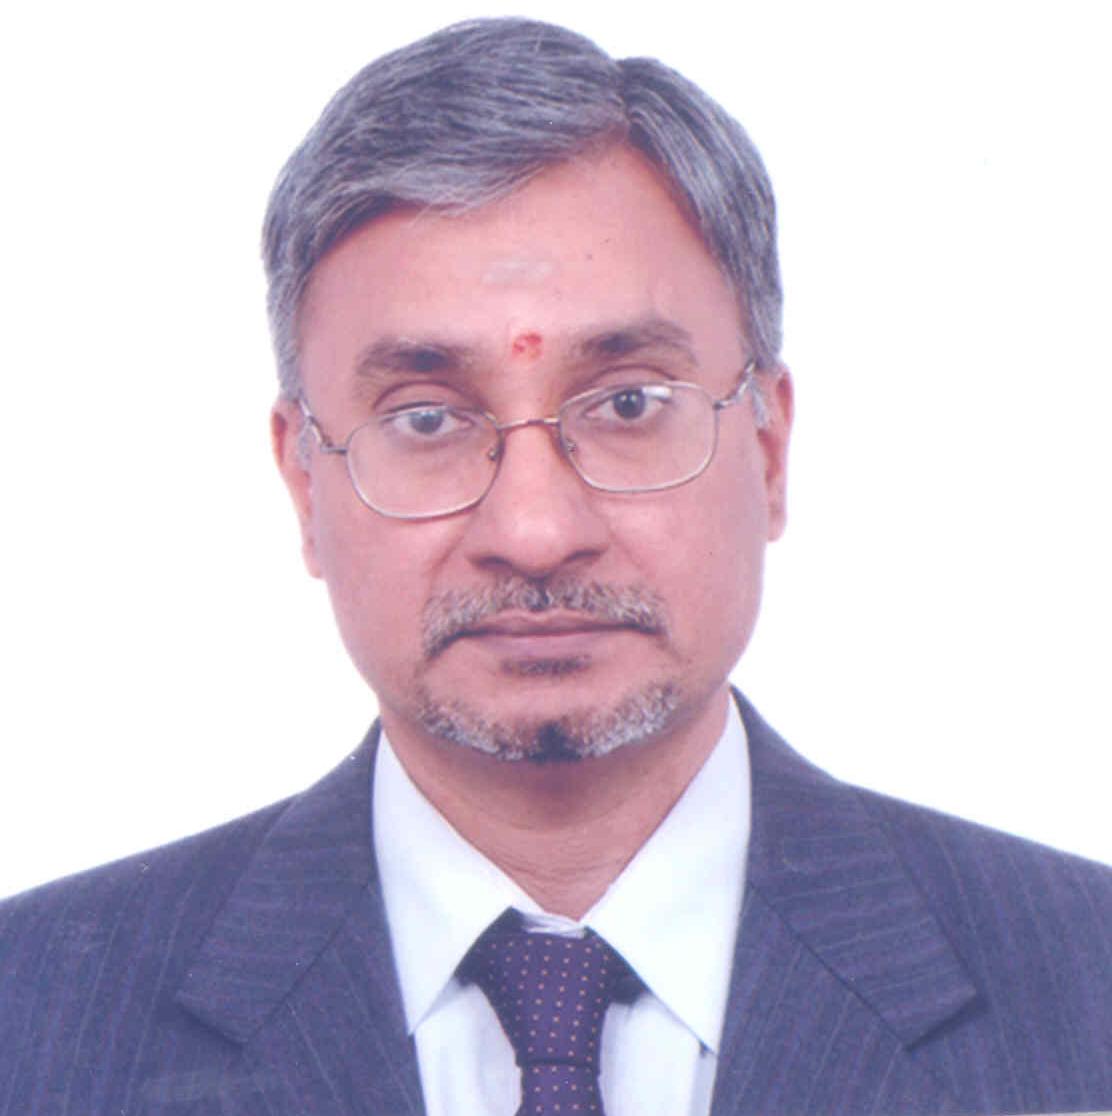 Profile image of Natarajan, Prof. Srinivasan